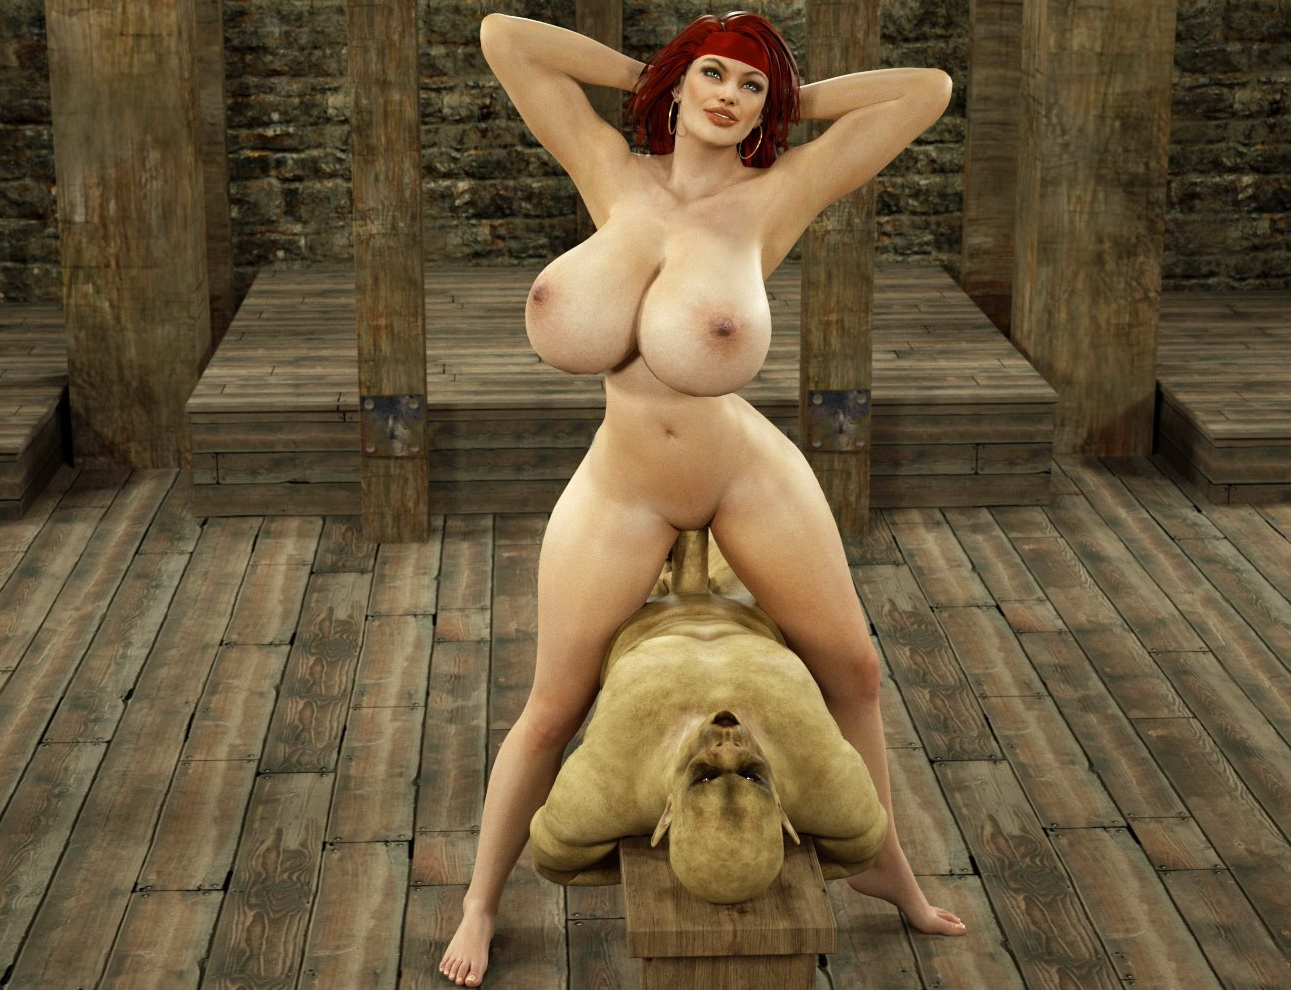 Monster sex galleries sex clips